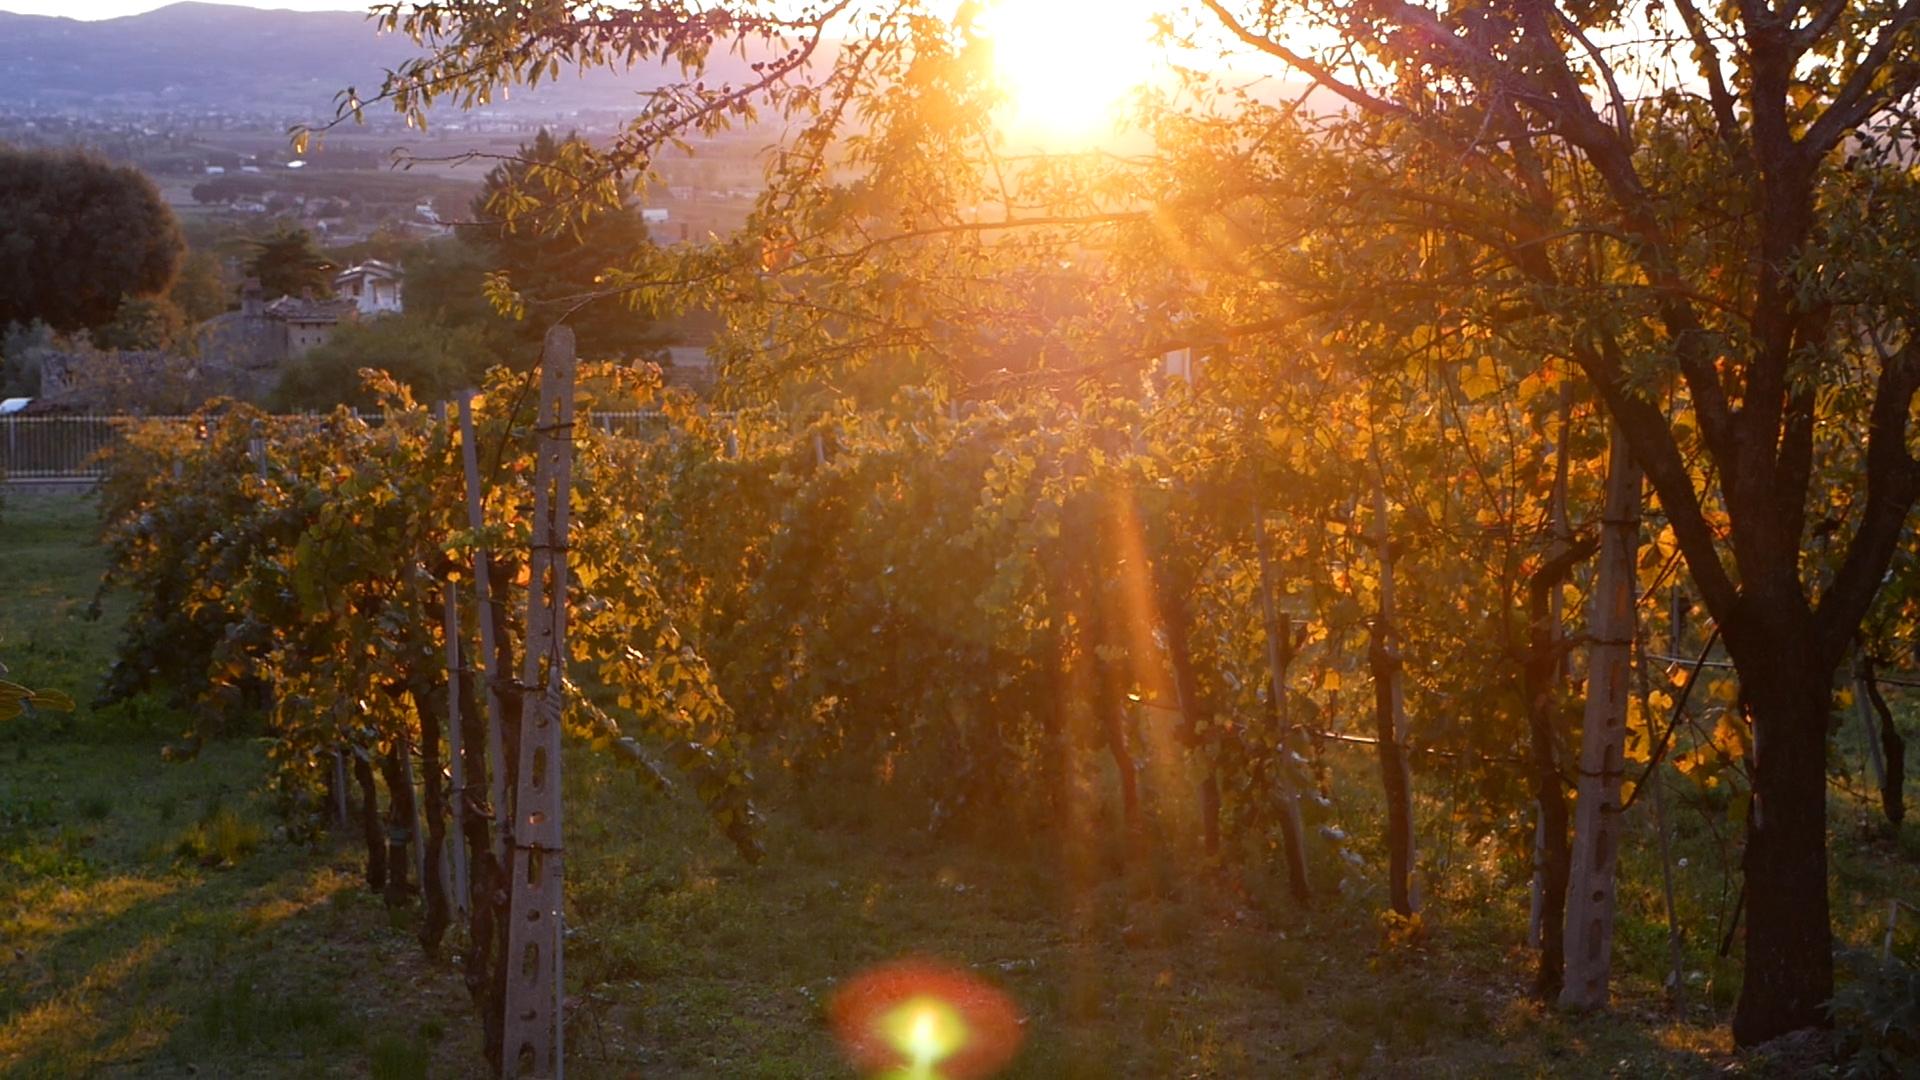 Esperienza sensoriale Assisi Tili Vini - Vendemmiamo insieme 10